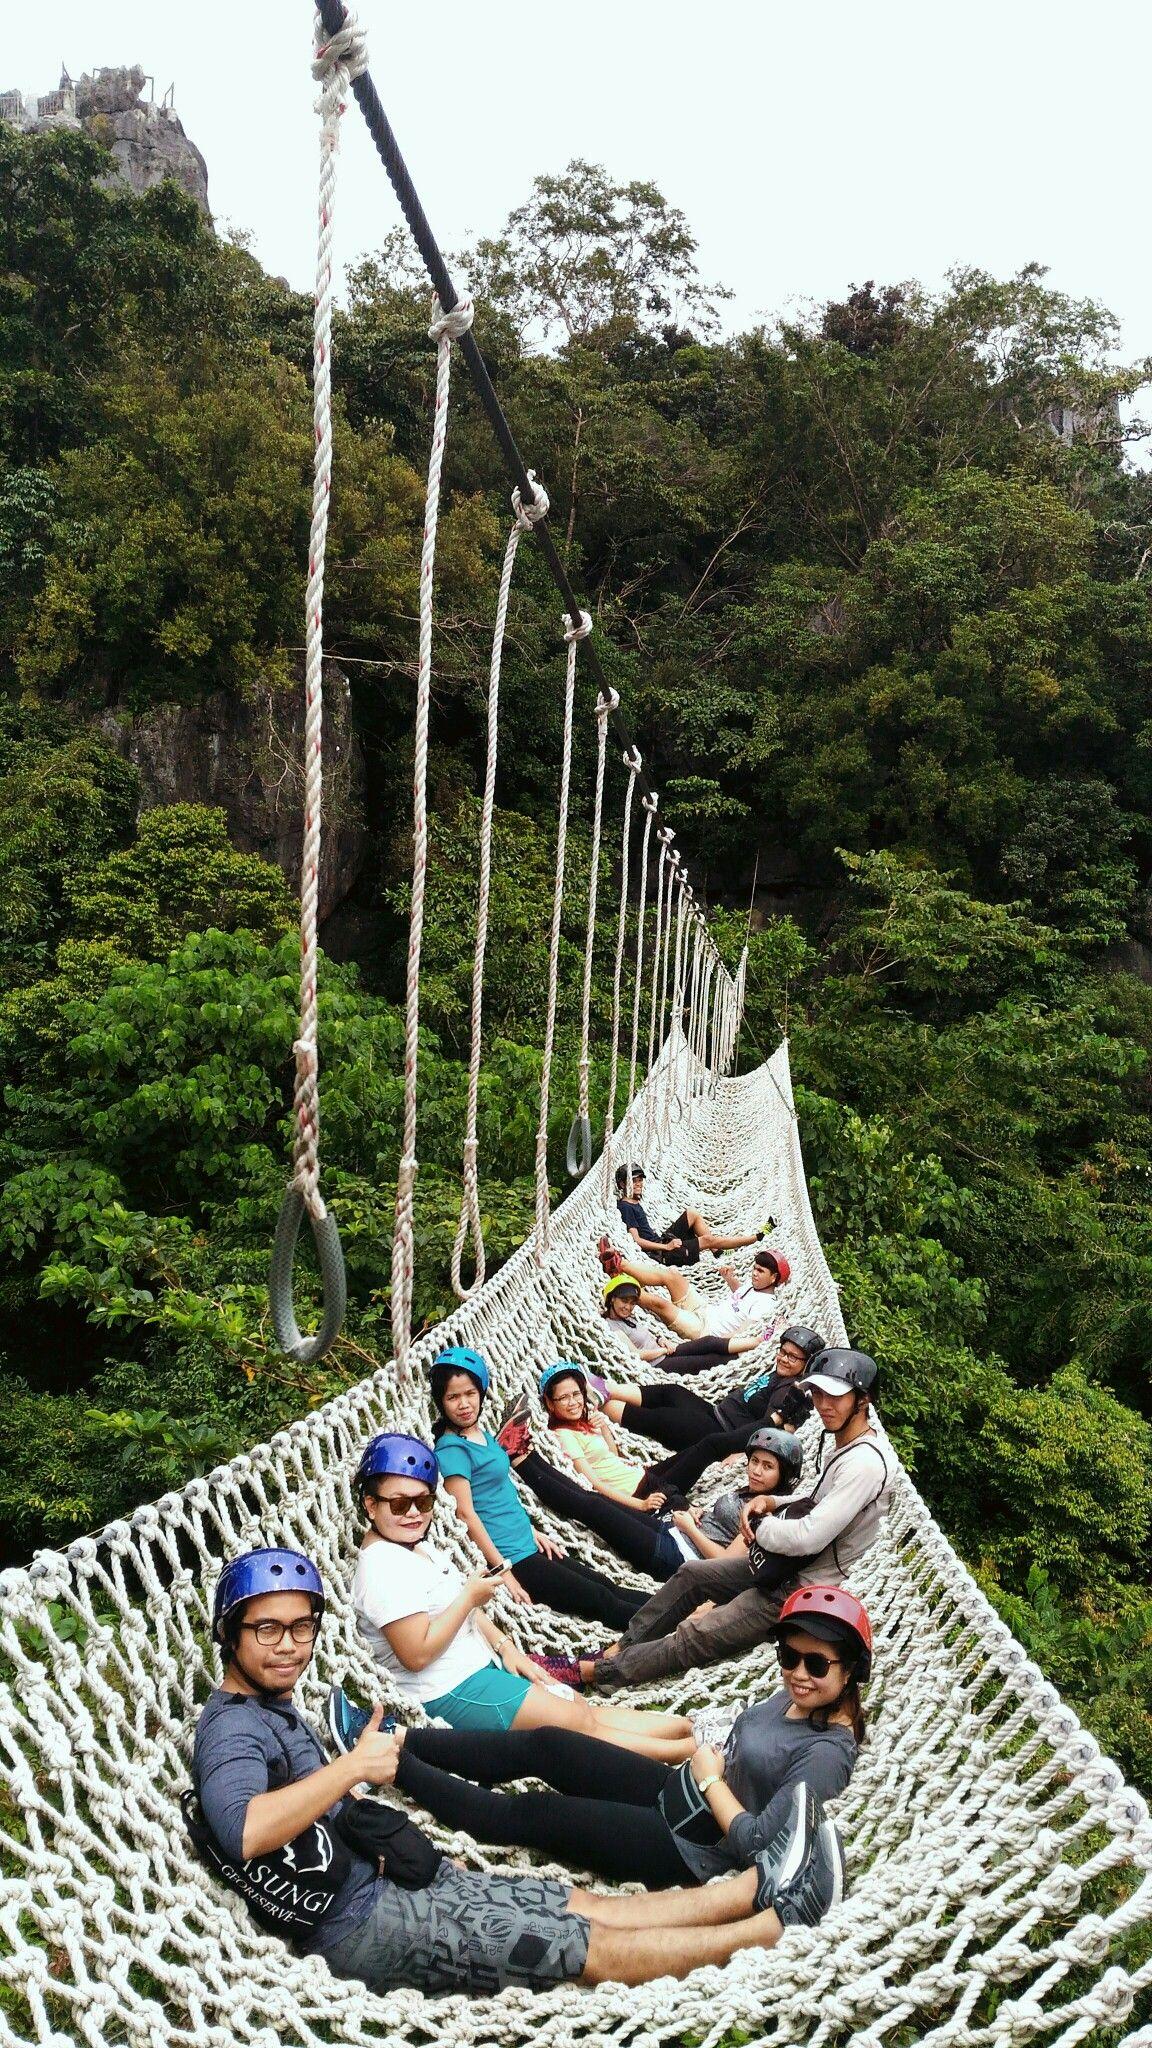 island hammock white cotton original pawleys single hammocks rope p ft